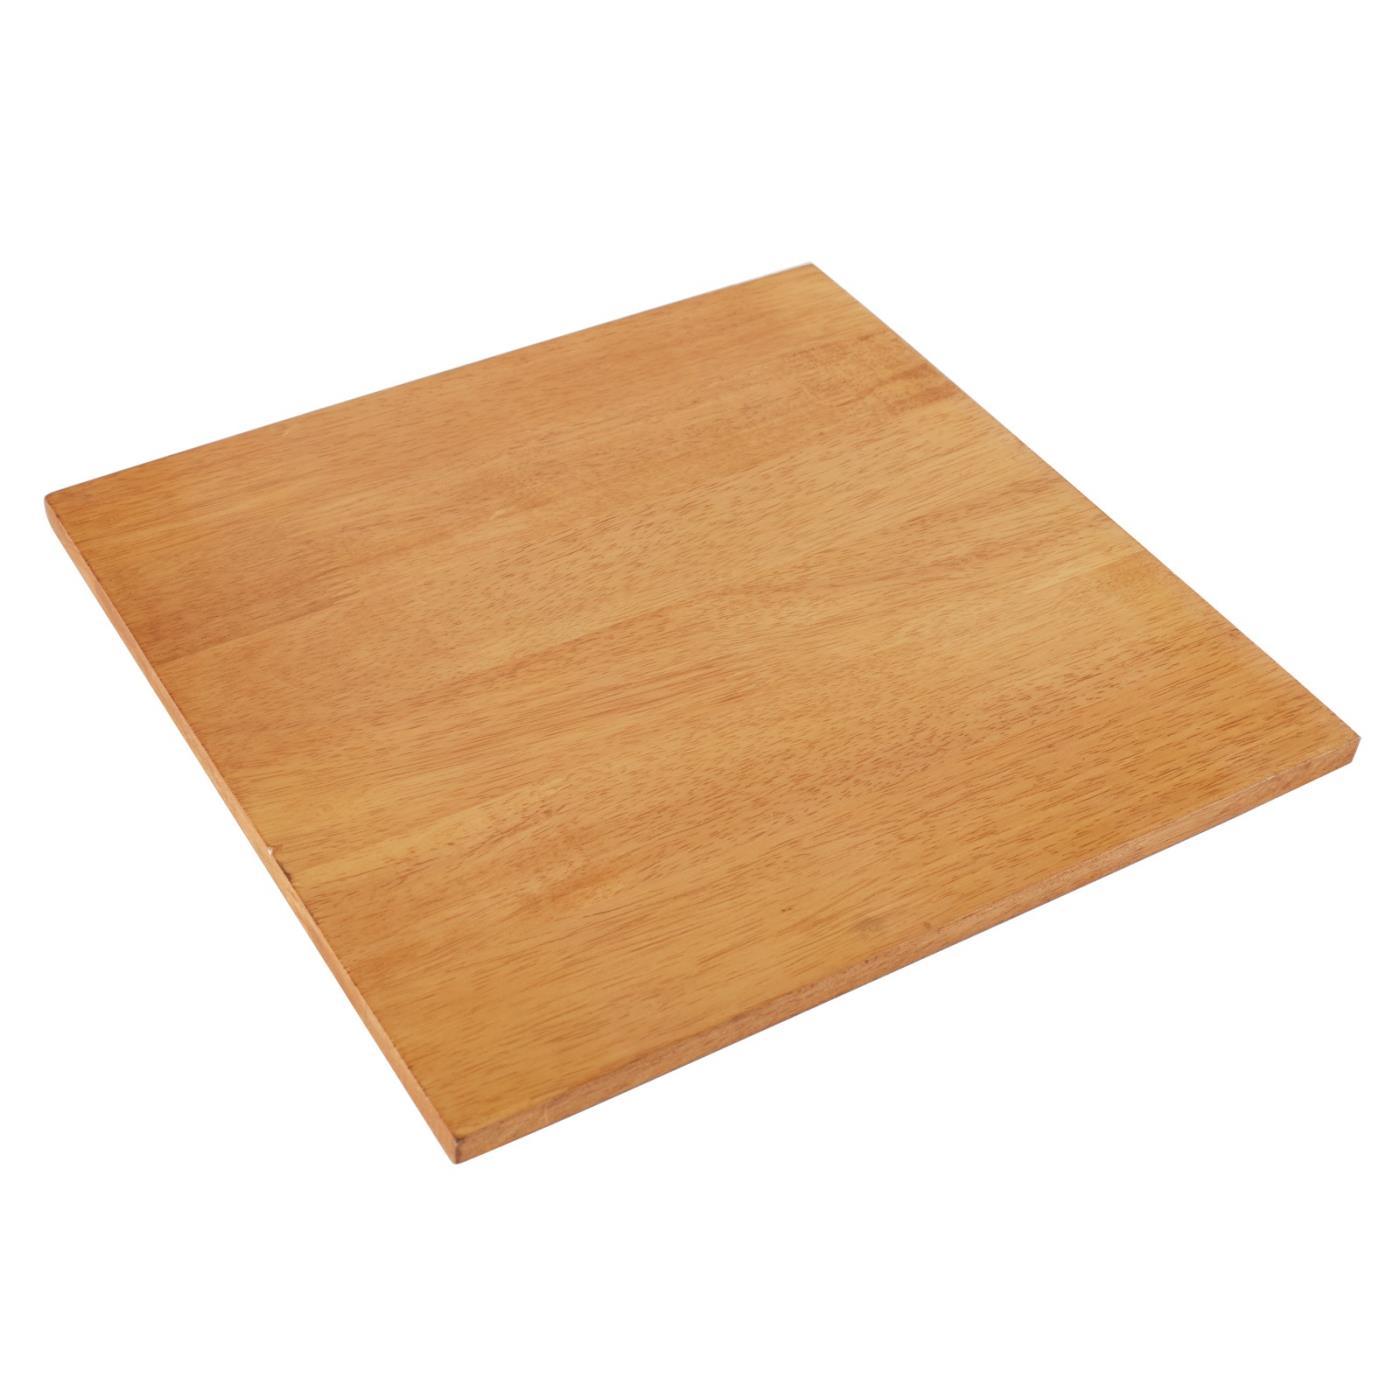 "LACS Square Platform - Wood 14"" x 14"""